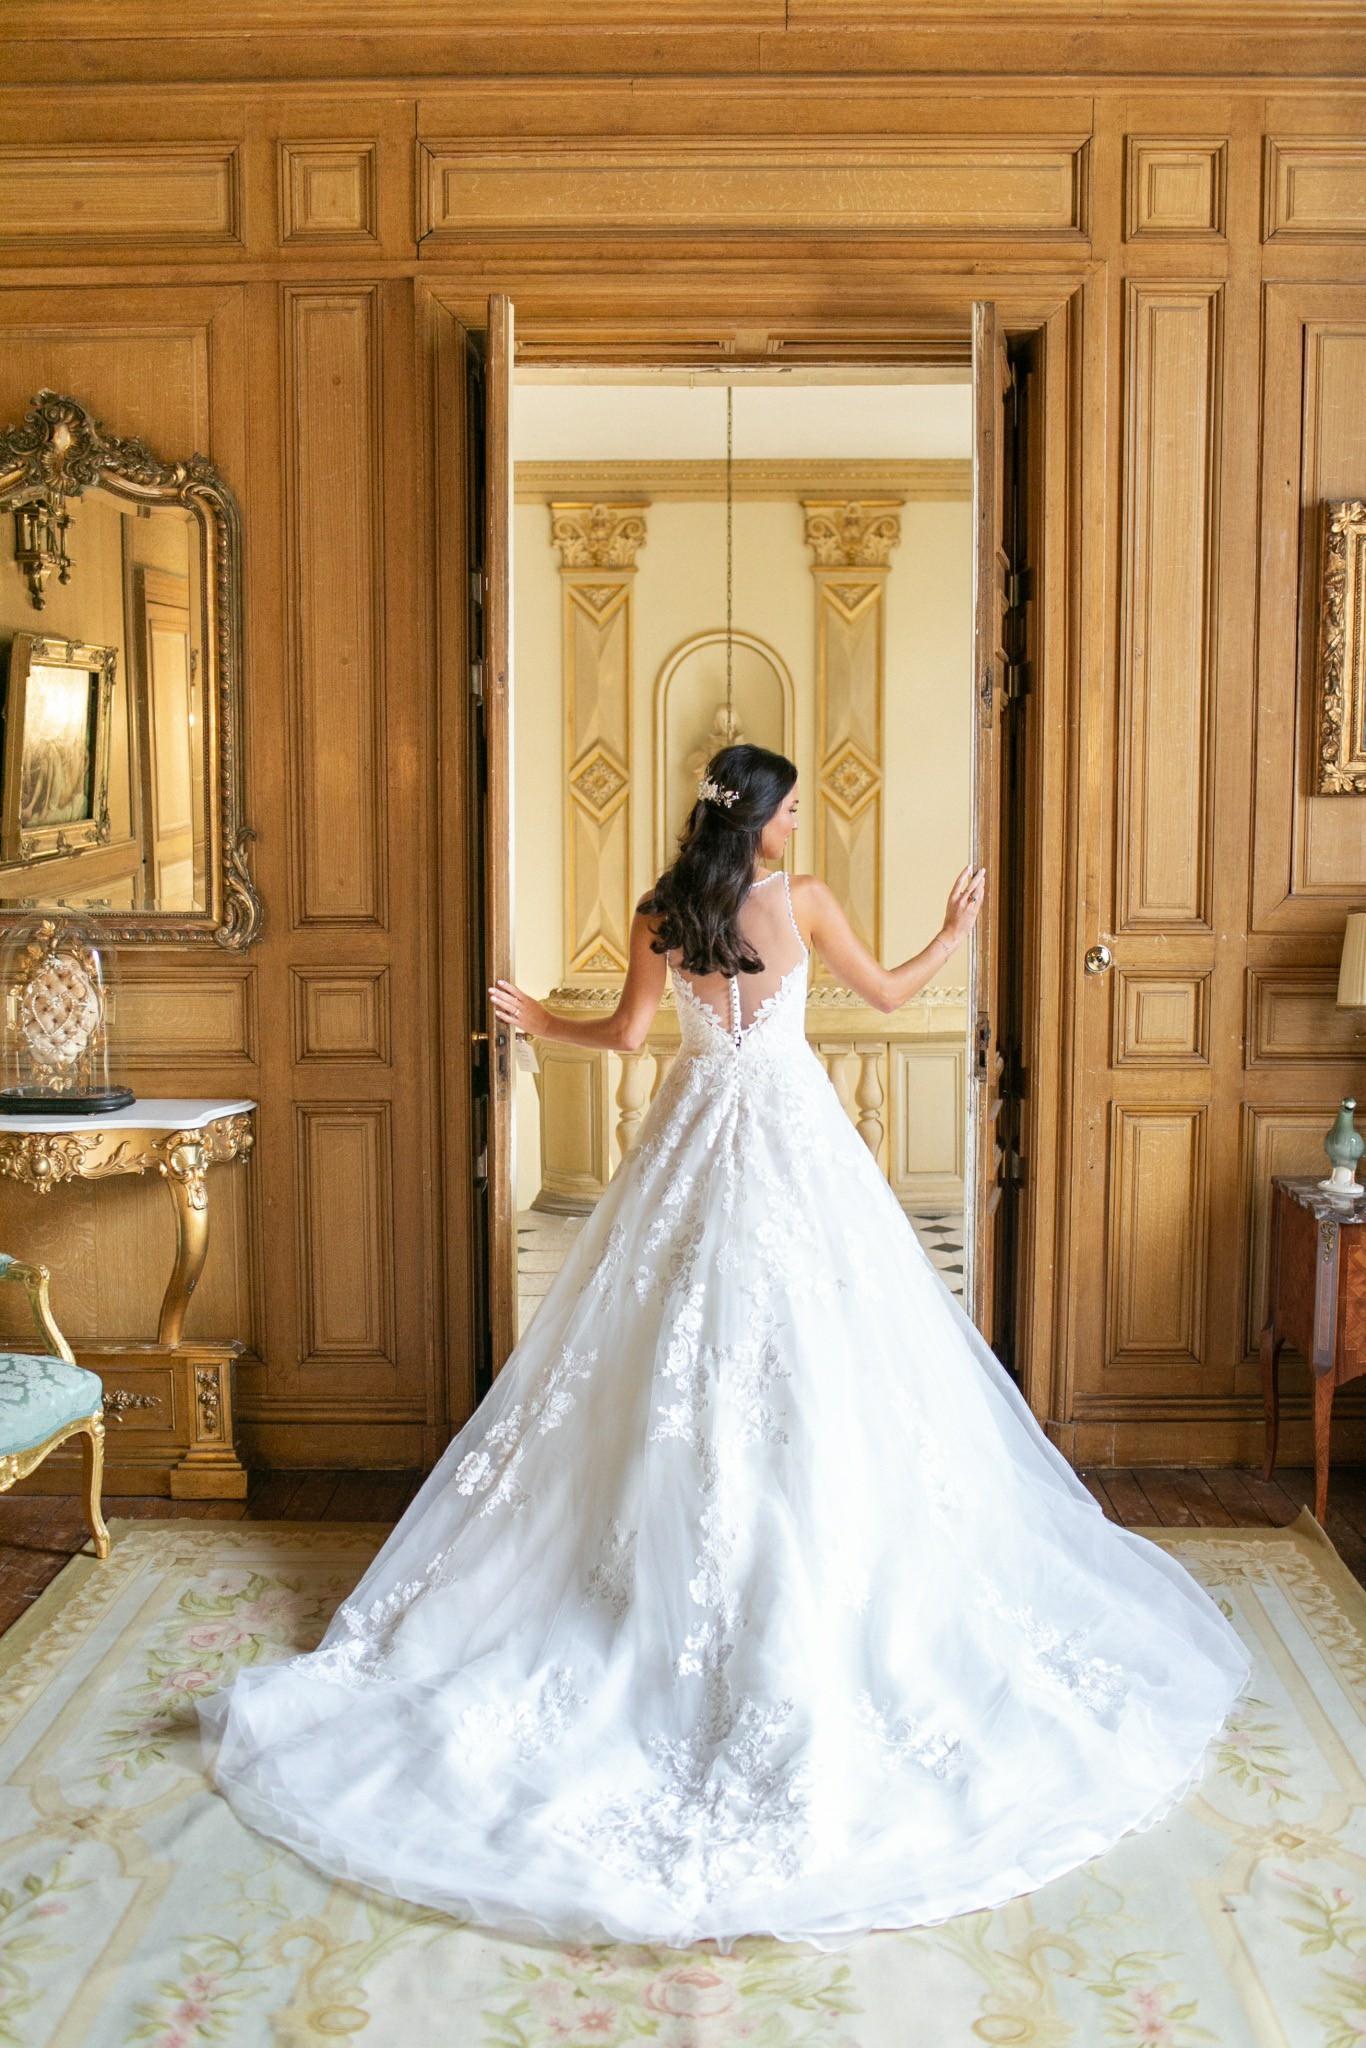 Elsira Pronovias 61 Off Tajpalace Net,Wedding Guest Gown Velvet Dresses Pakistani